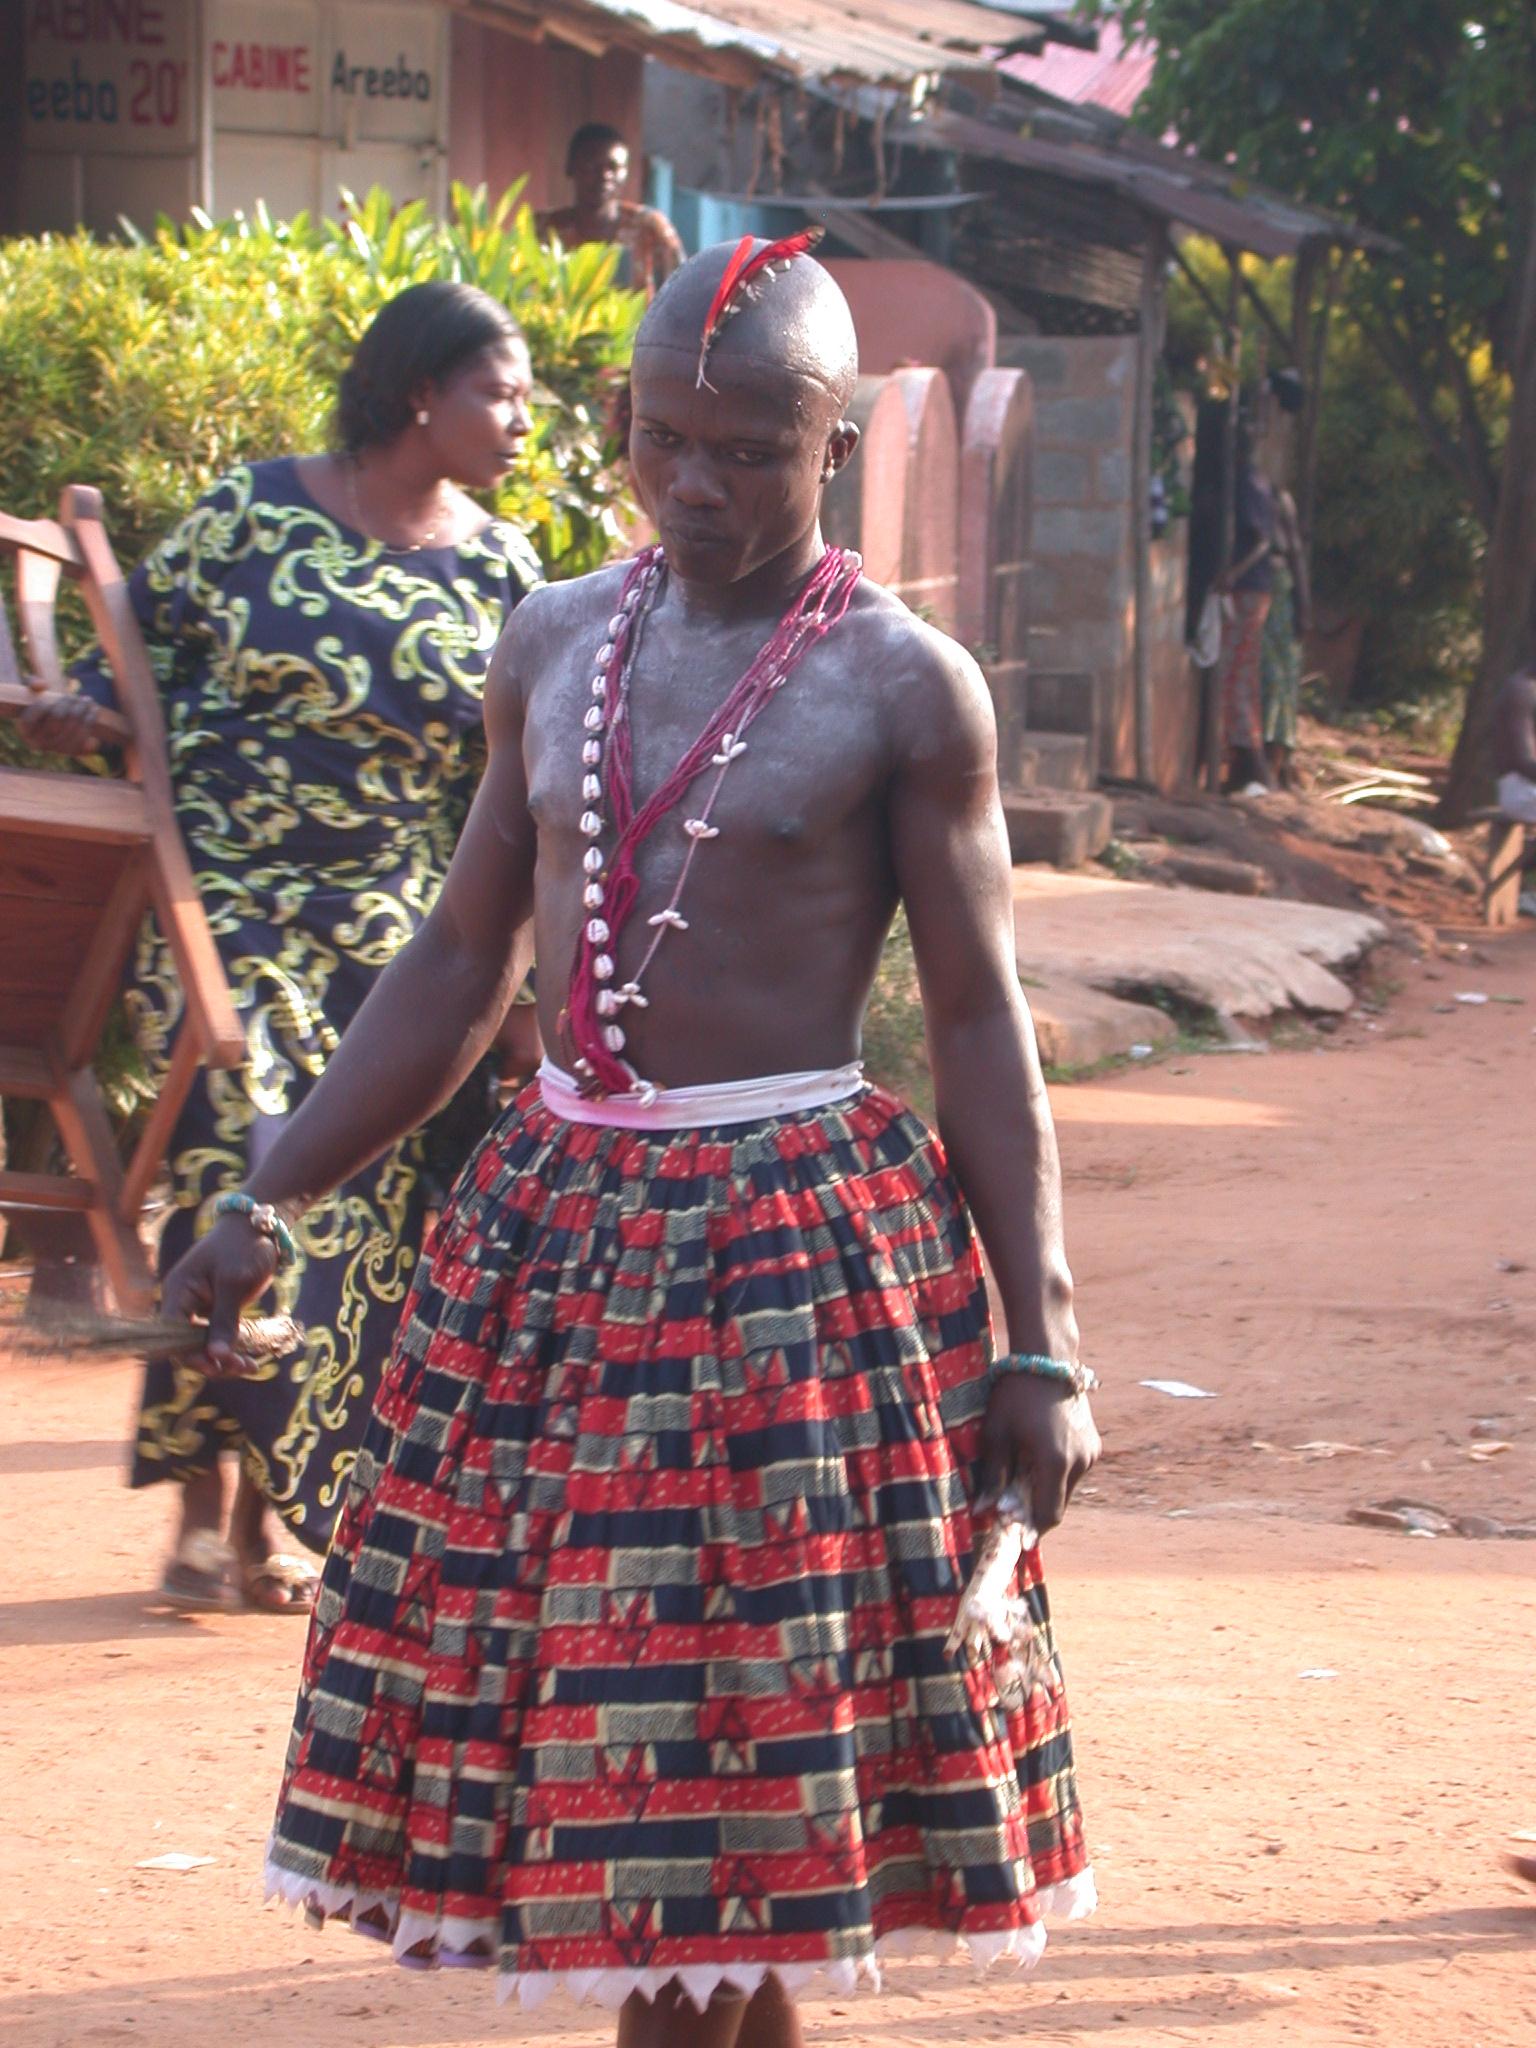 Gender-Bending Vodun Devotee, Vodun Ritual, Ouidah, Benin